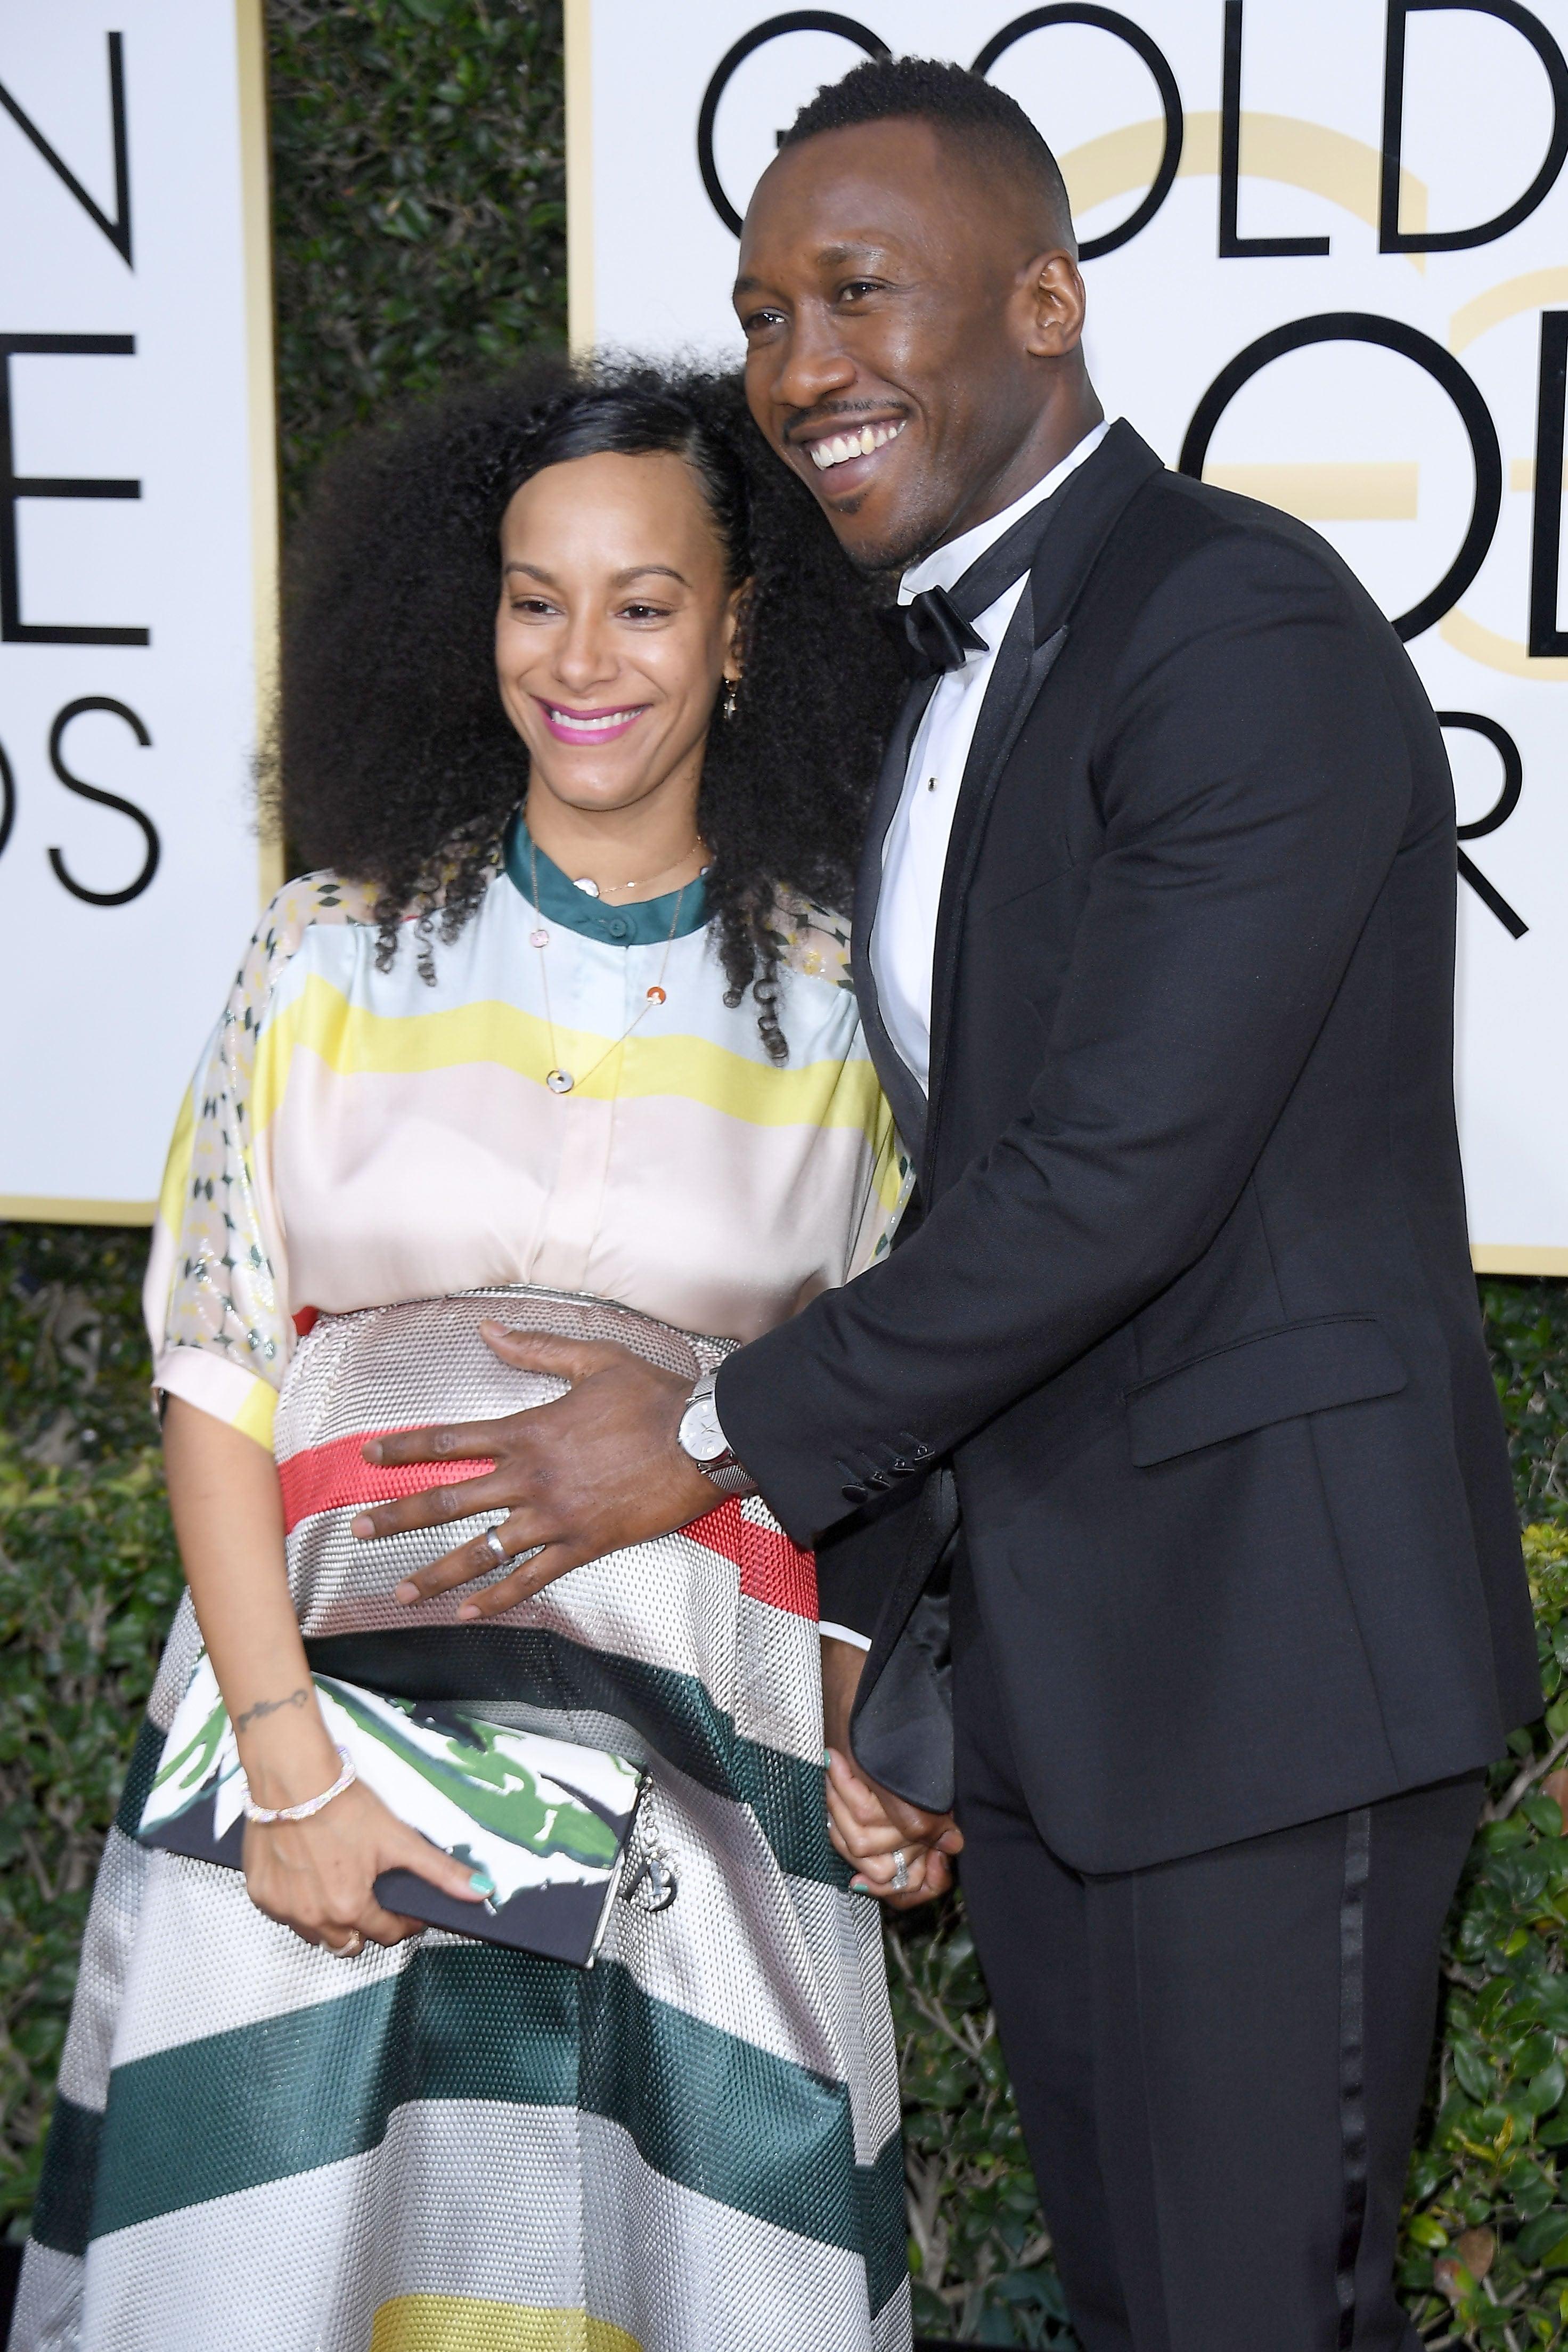 Successful Black Couples Photos